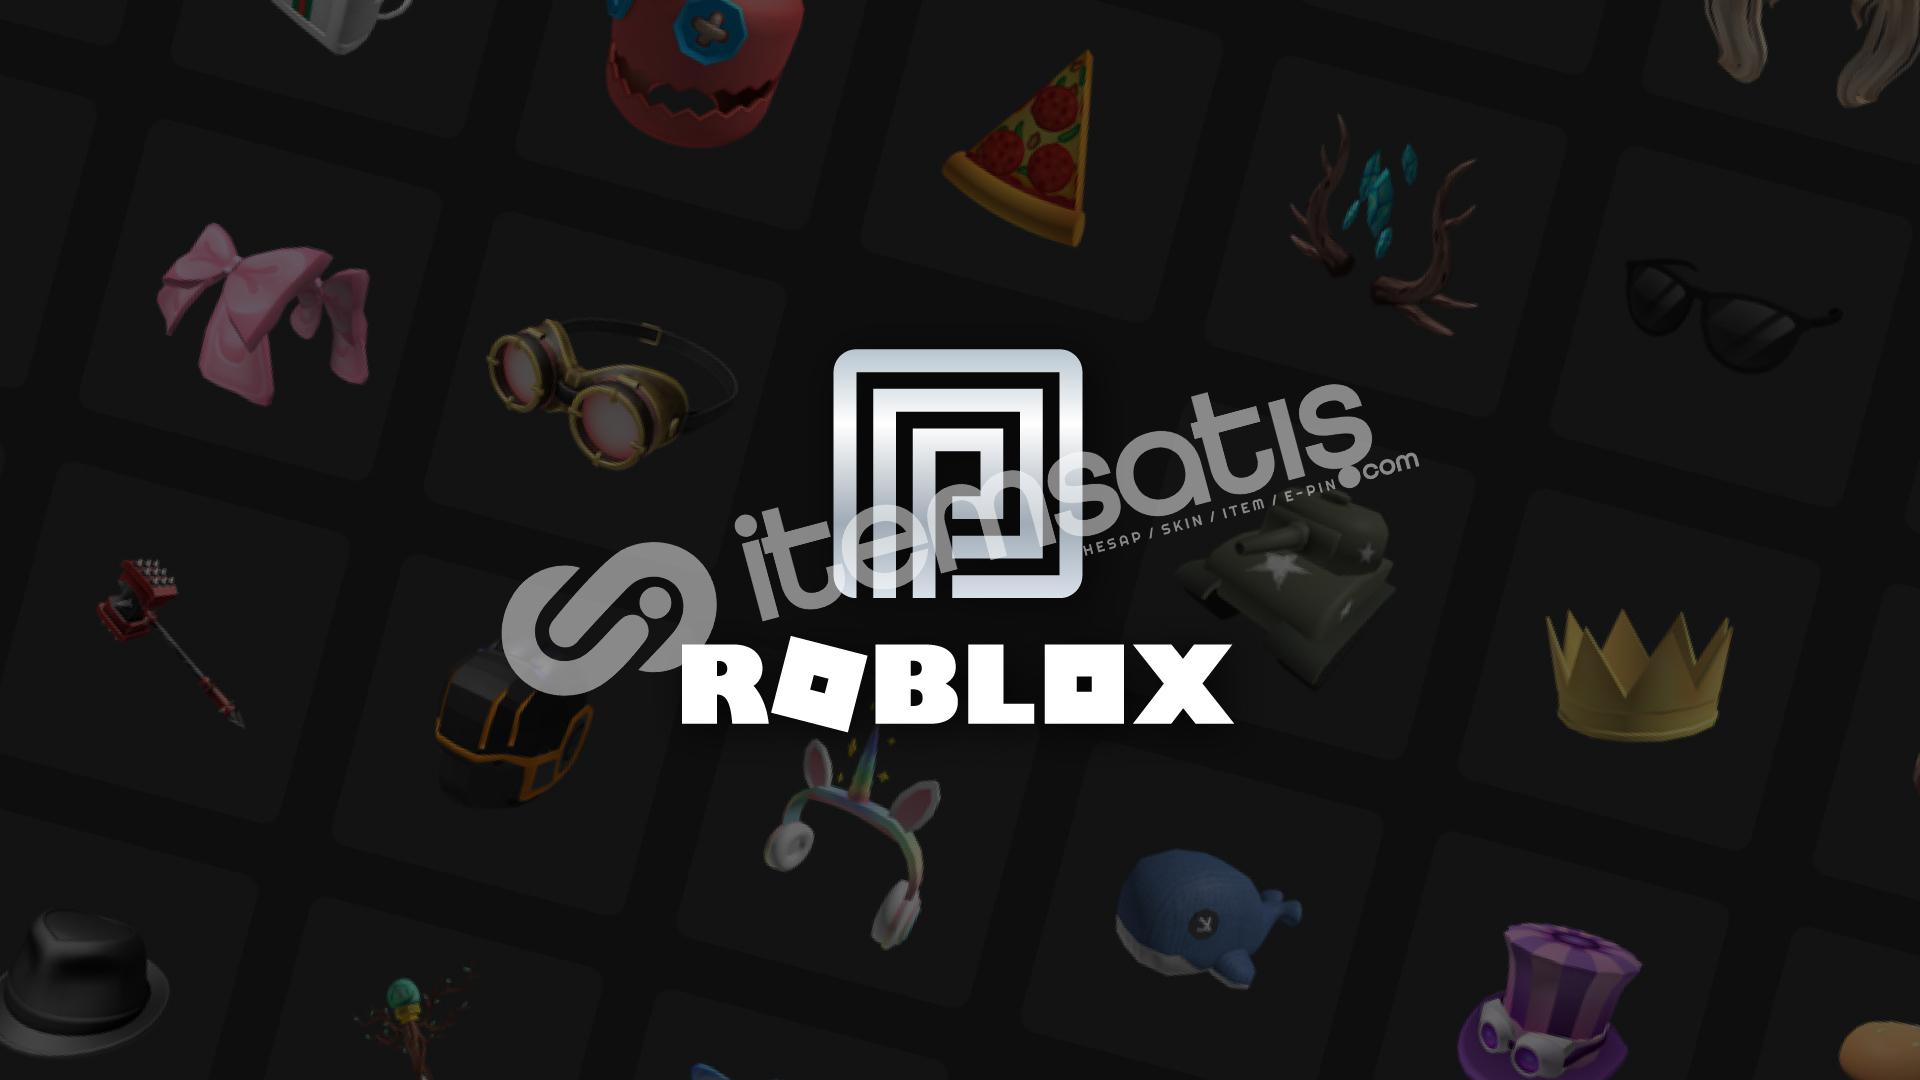 Roblox 400 Robux (İndirimli)